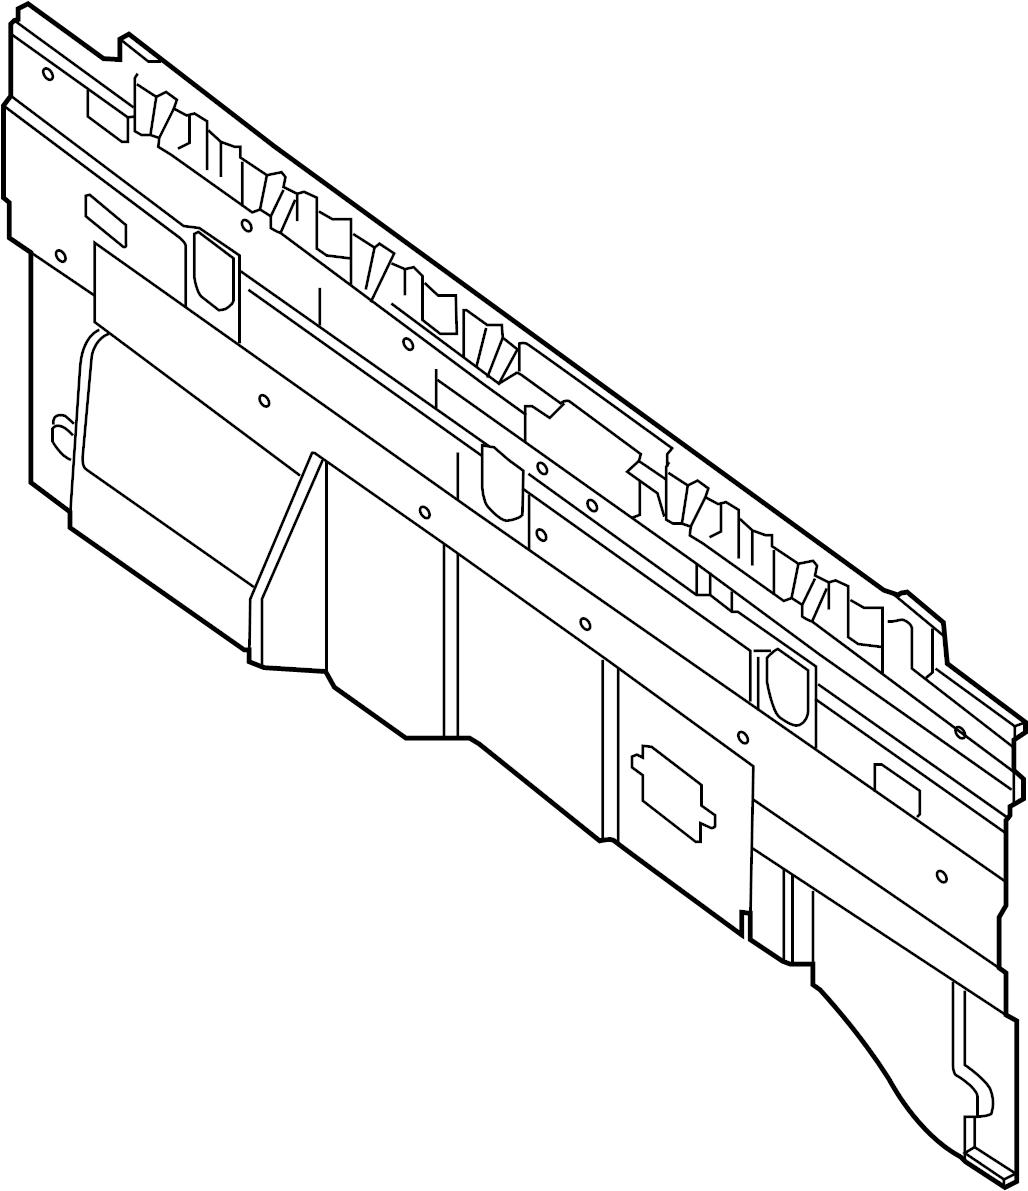 Nissan Titan Finisher Panel Rear